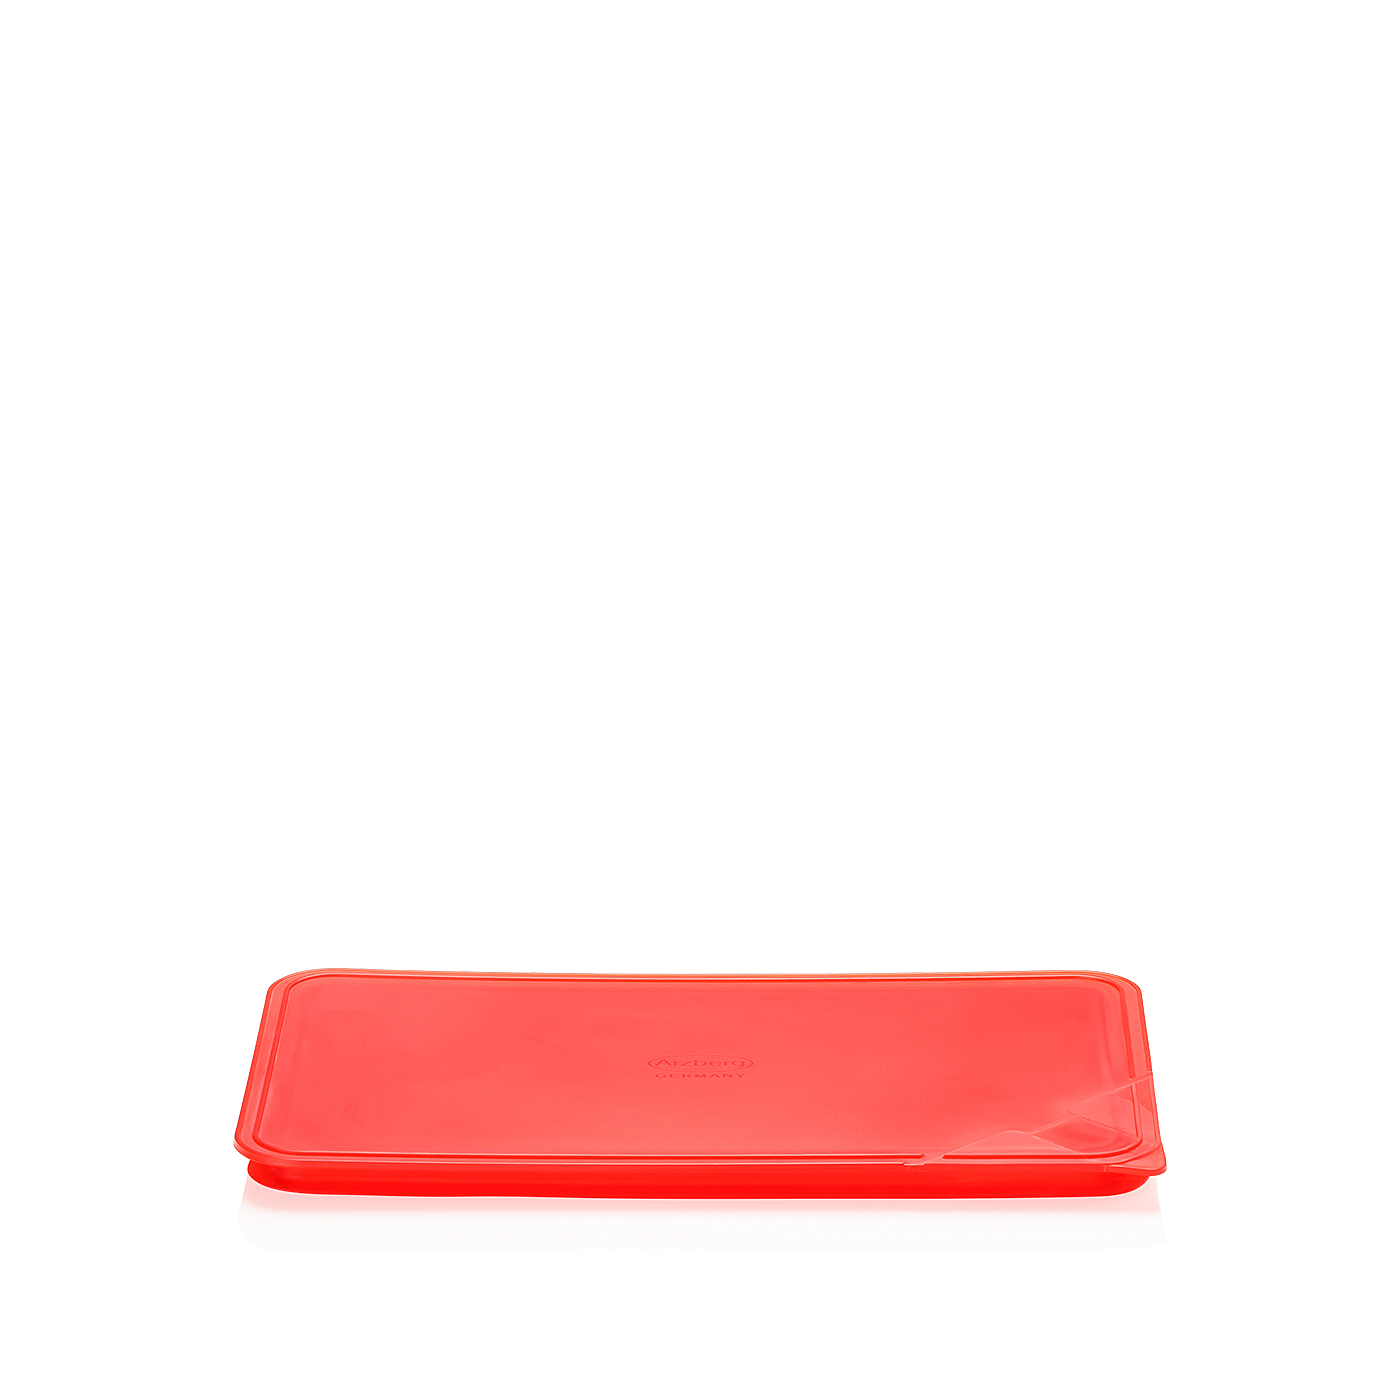 Aromadeckel 15x25 cm Küchenfreunde Kunststoff rot Arzberg